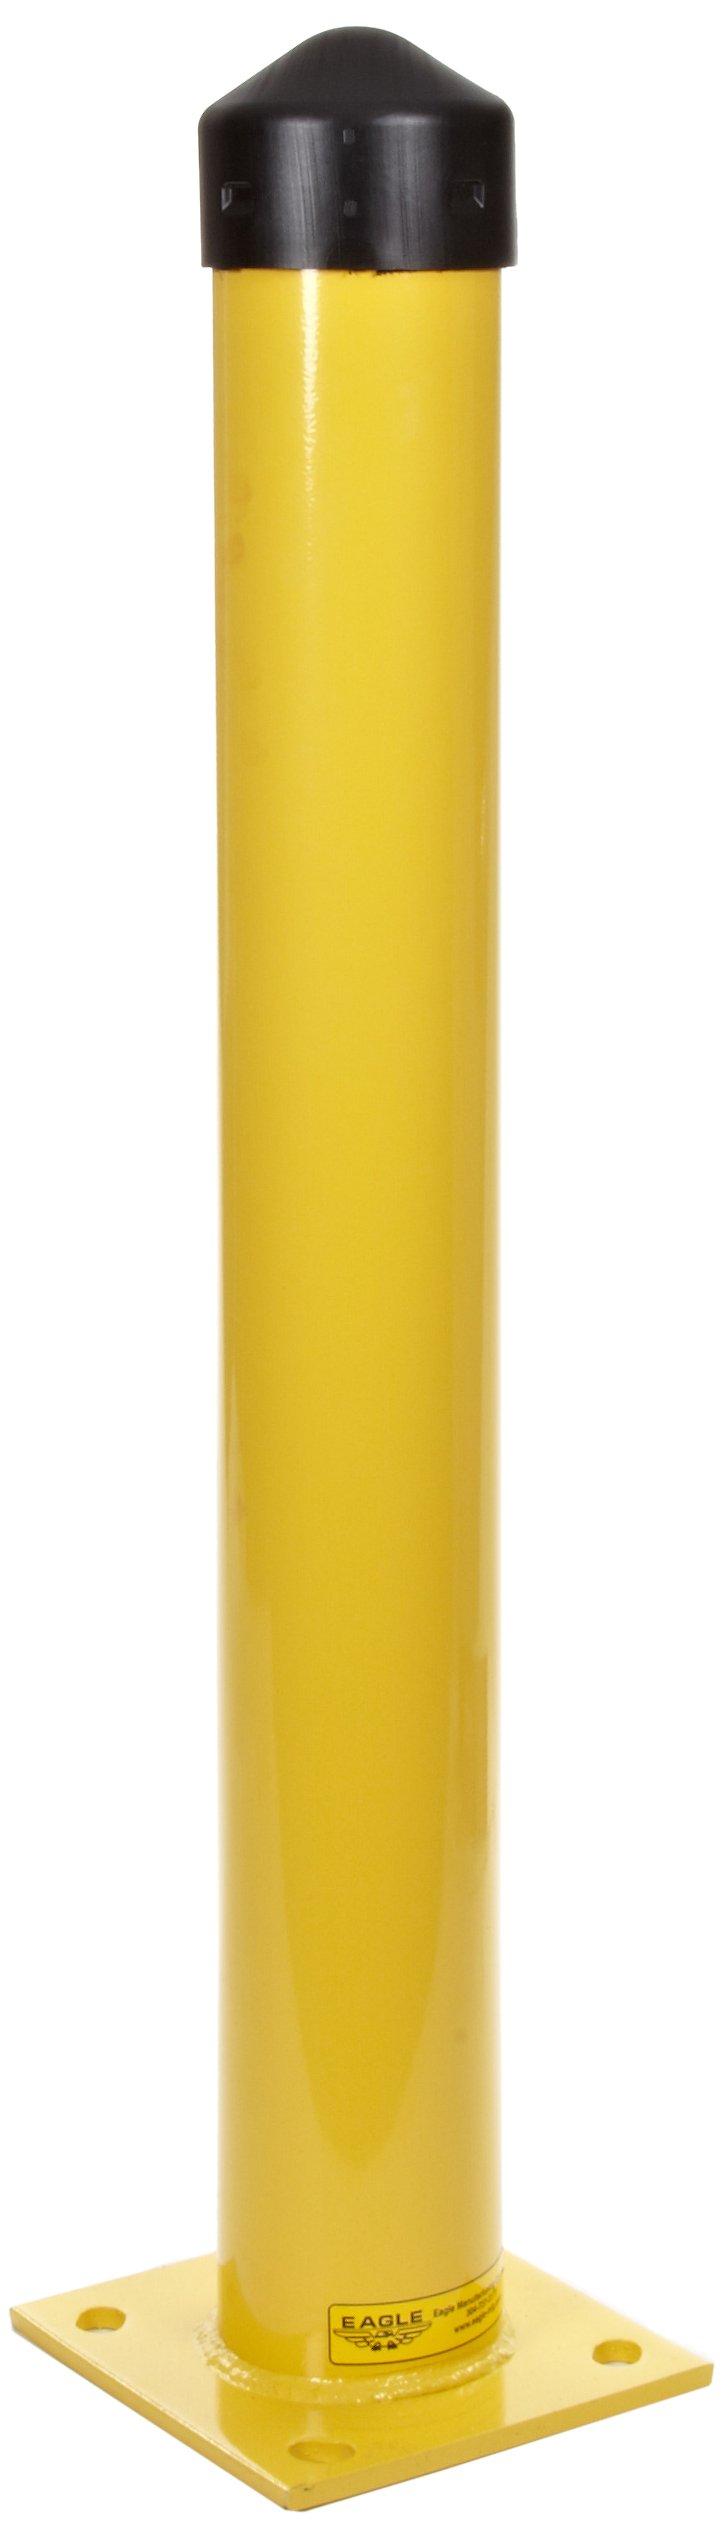 Eagle 1743 4'' Steel Round Bollard Post with Black HDPE Cap, Yellow Powder Coat Finish, 36'' Height, 4.5'' Diameter